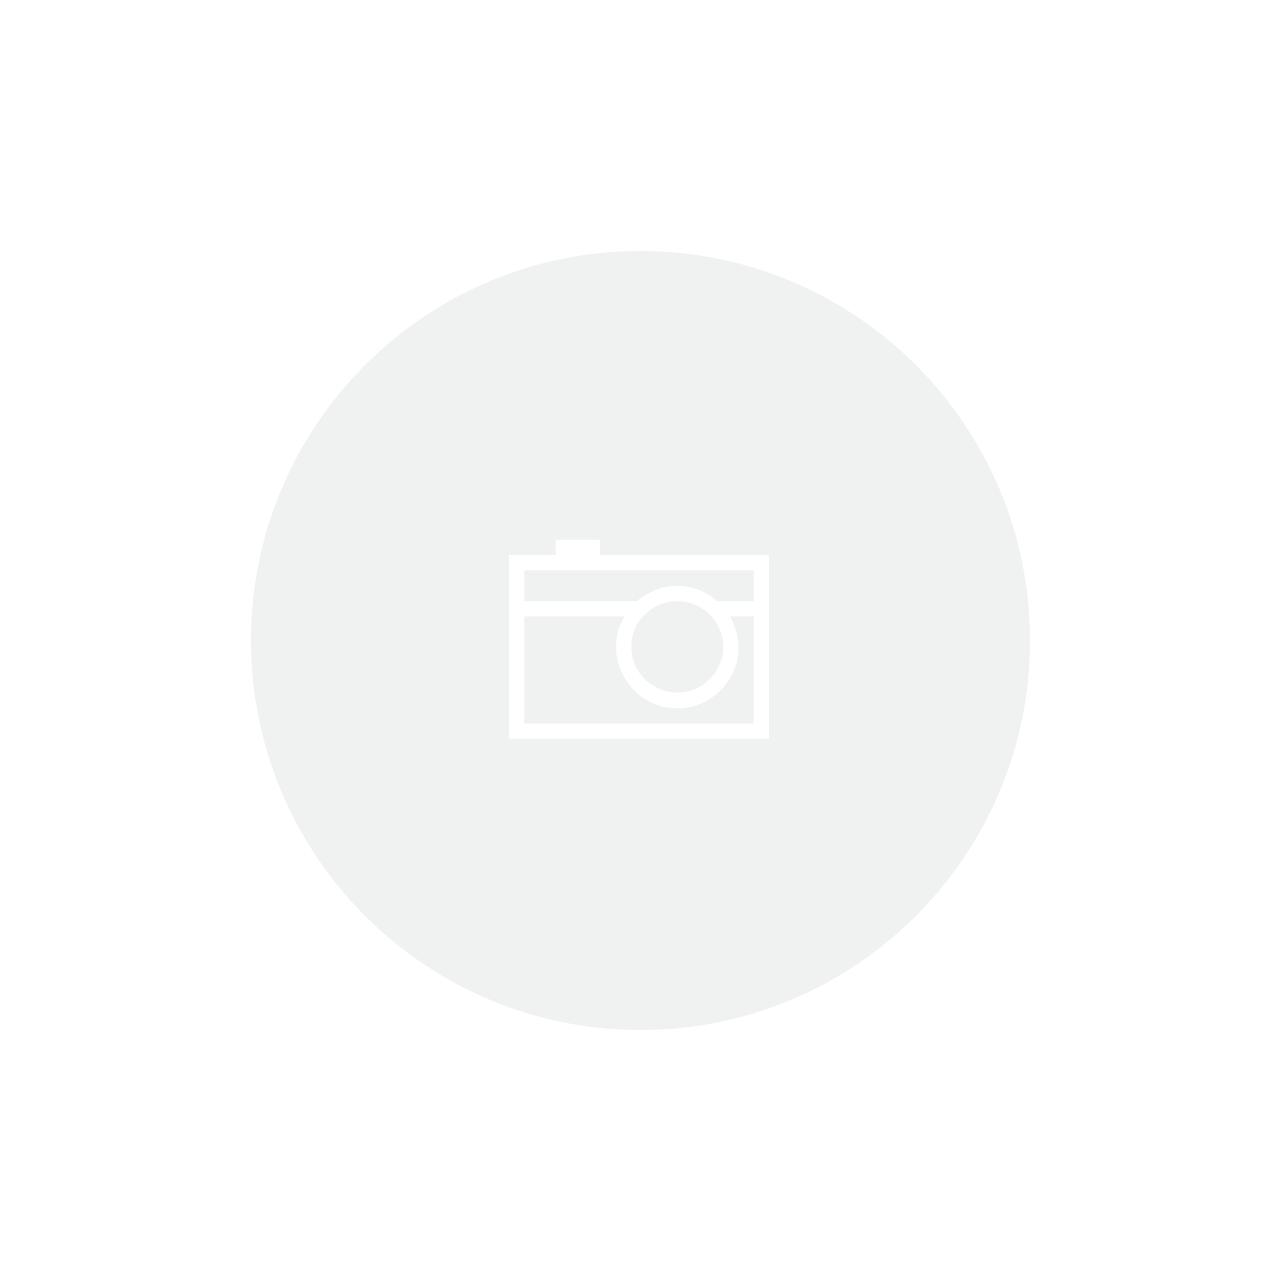 Papel Artesanal Indiano - Ref. 85